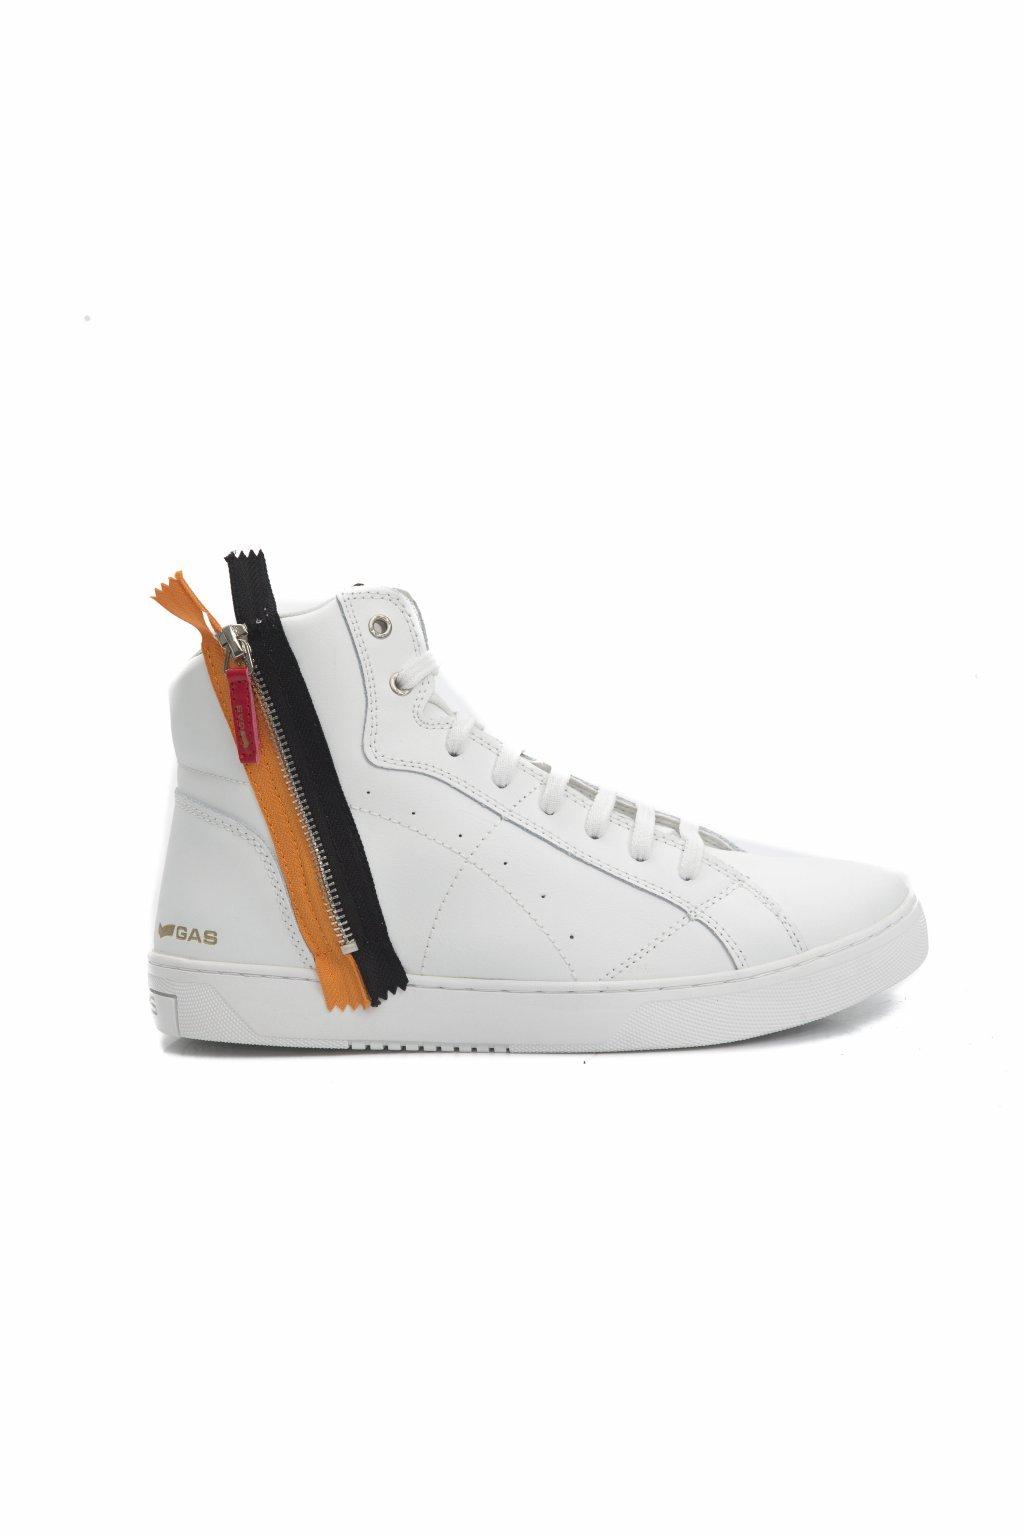 Značkové pánské sneakers Gas Jeans (Barva Bílá, Velikosti 44)